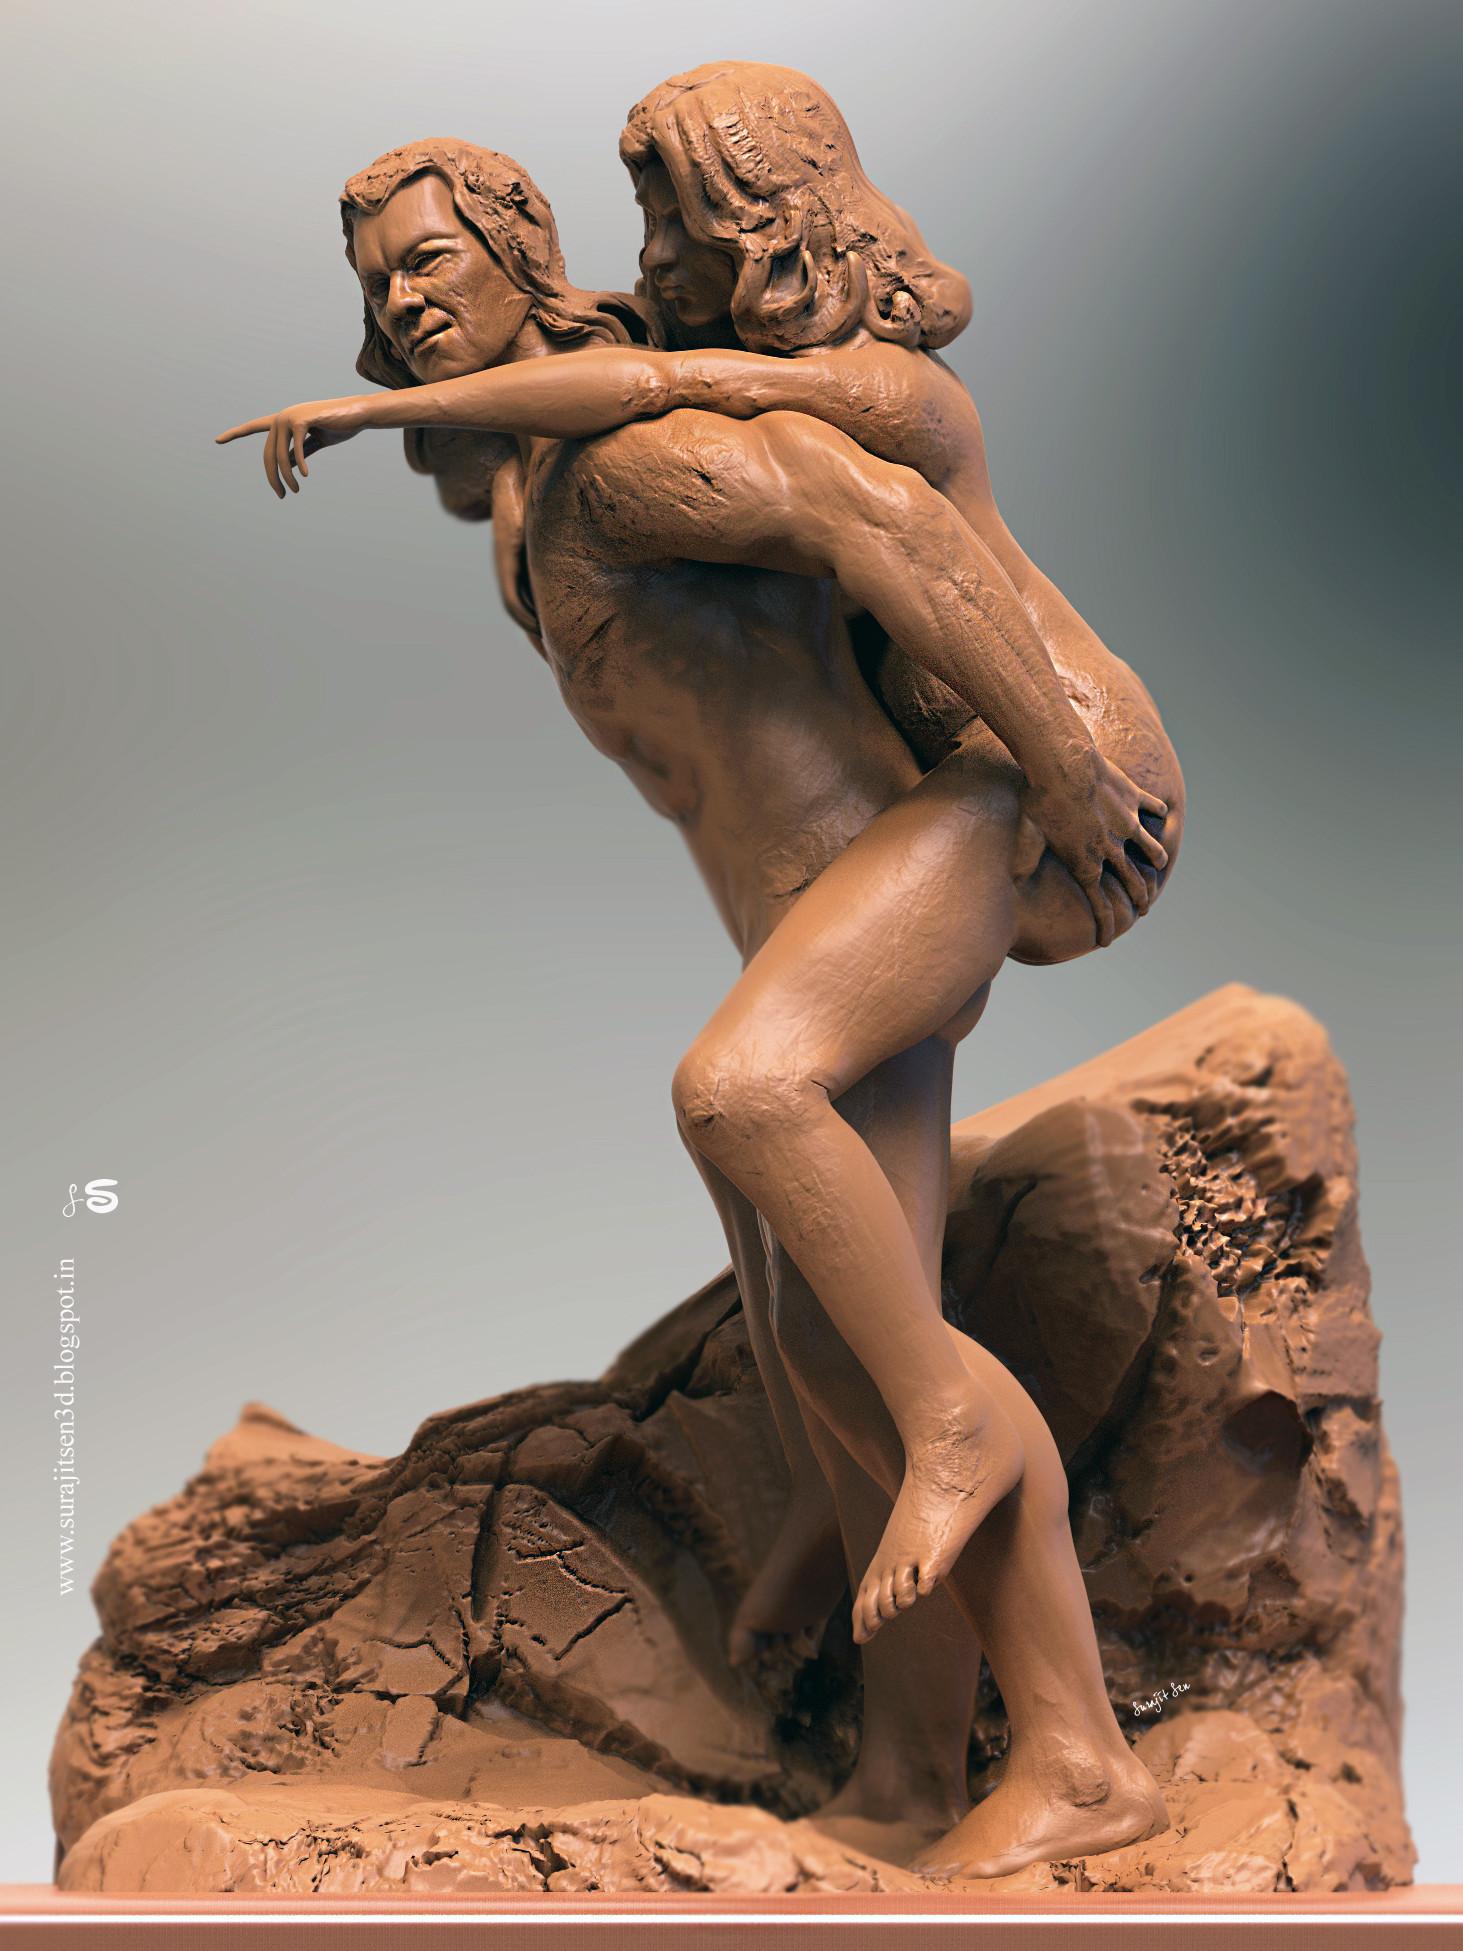 Surajit sen that way speed digital sculpt study surajitsen jan2019